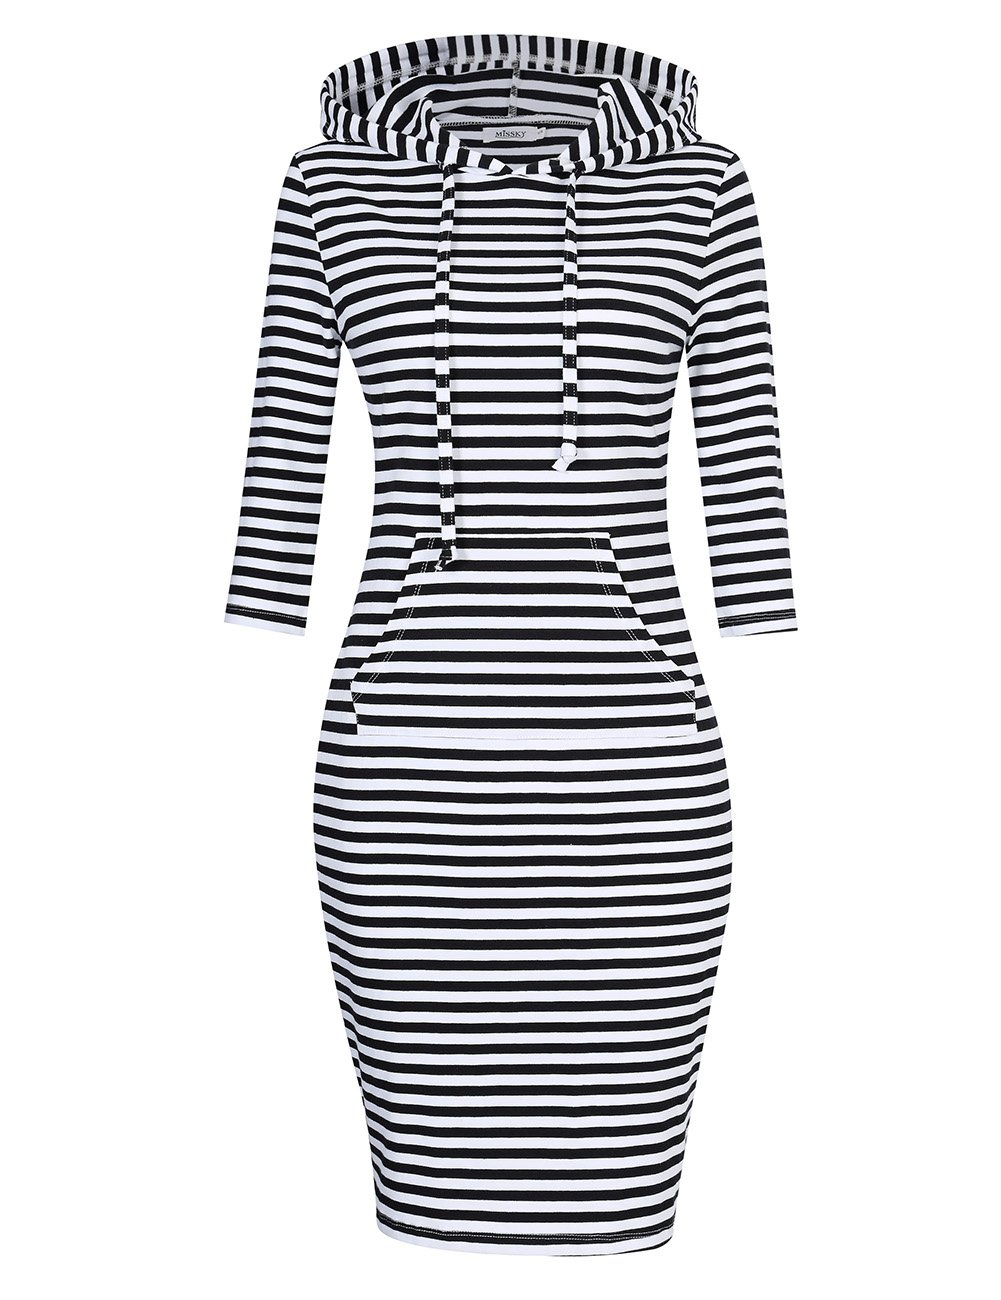 MISSKY Women Pullover Hoodie Dress Stripe Pocket 3/4 Long Sleeve Cotton Slim Keen Length Sweatshirt Dress Black-White L